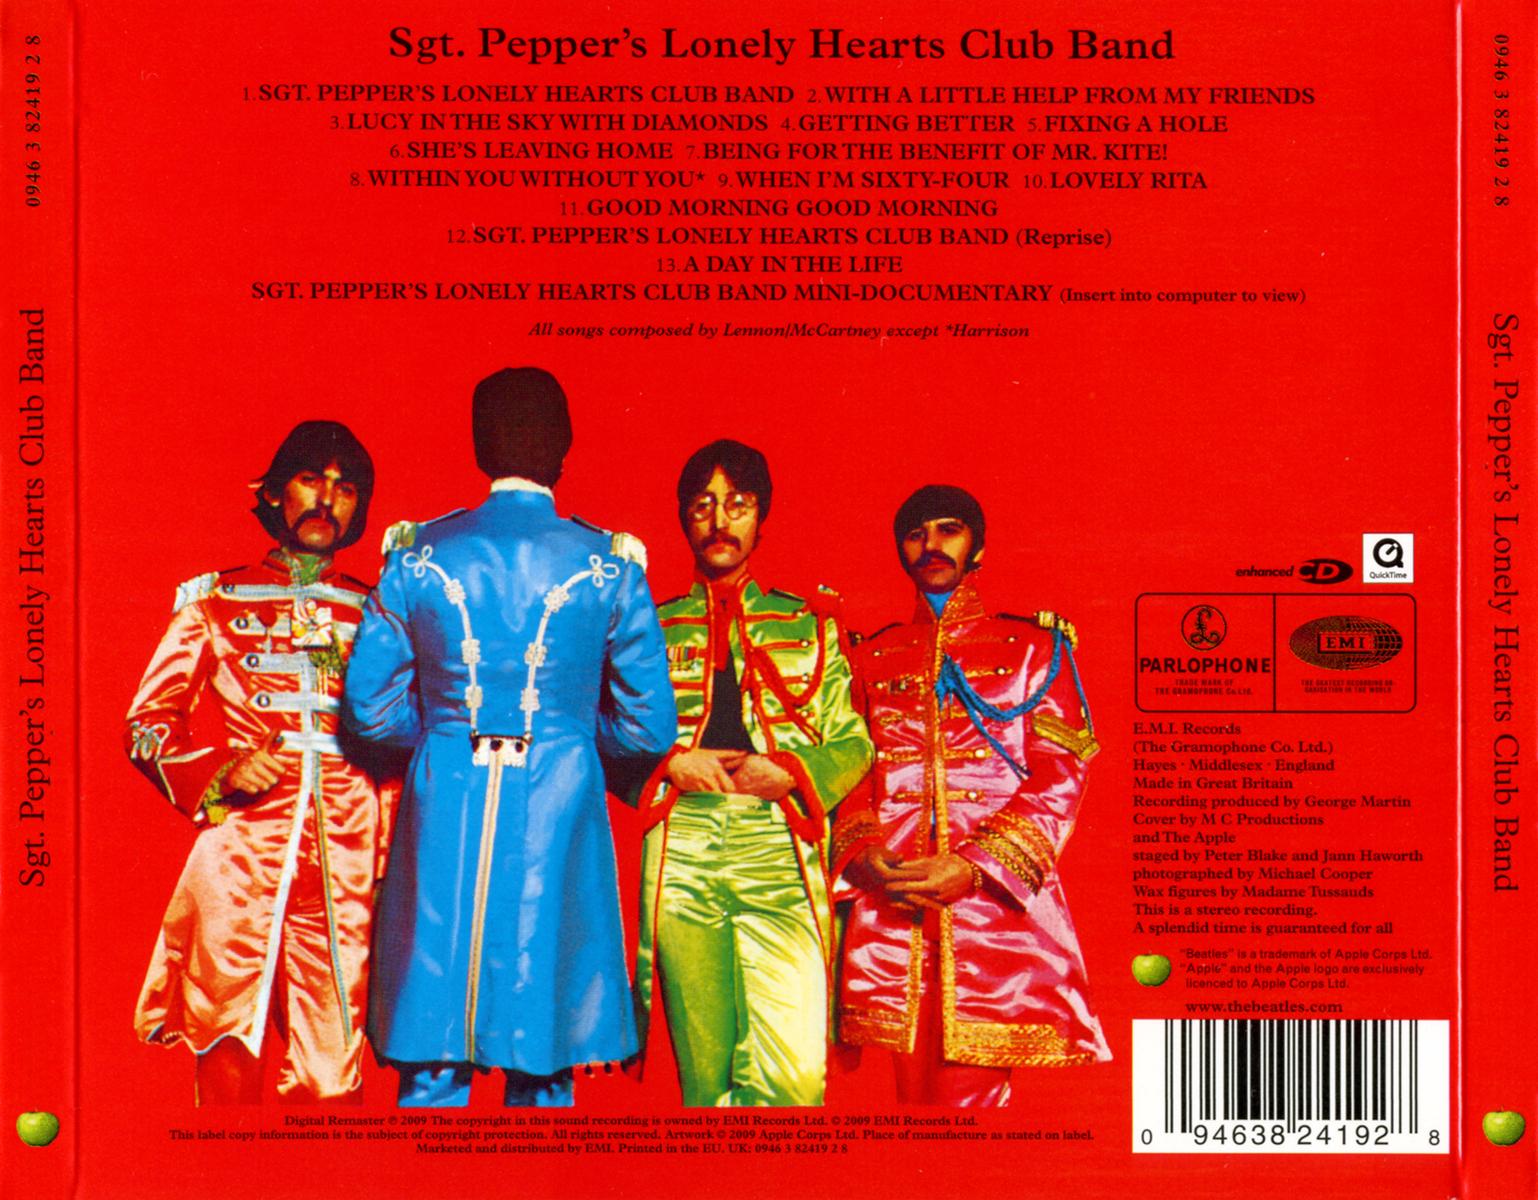 Beatles club Band Flac